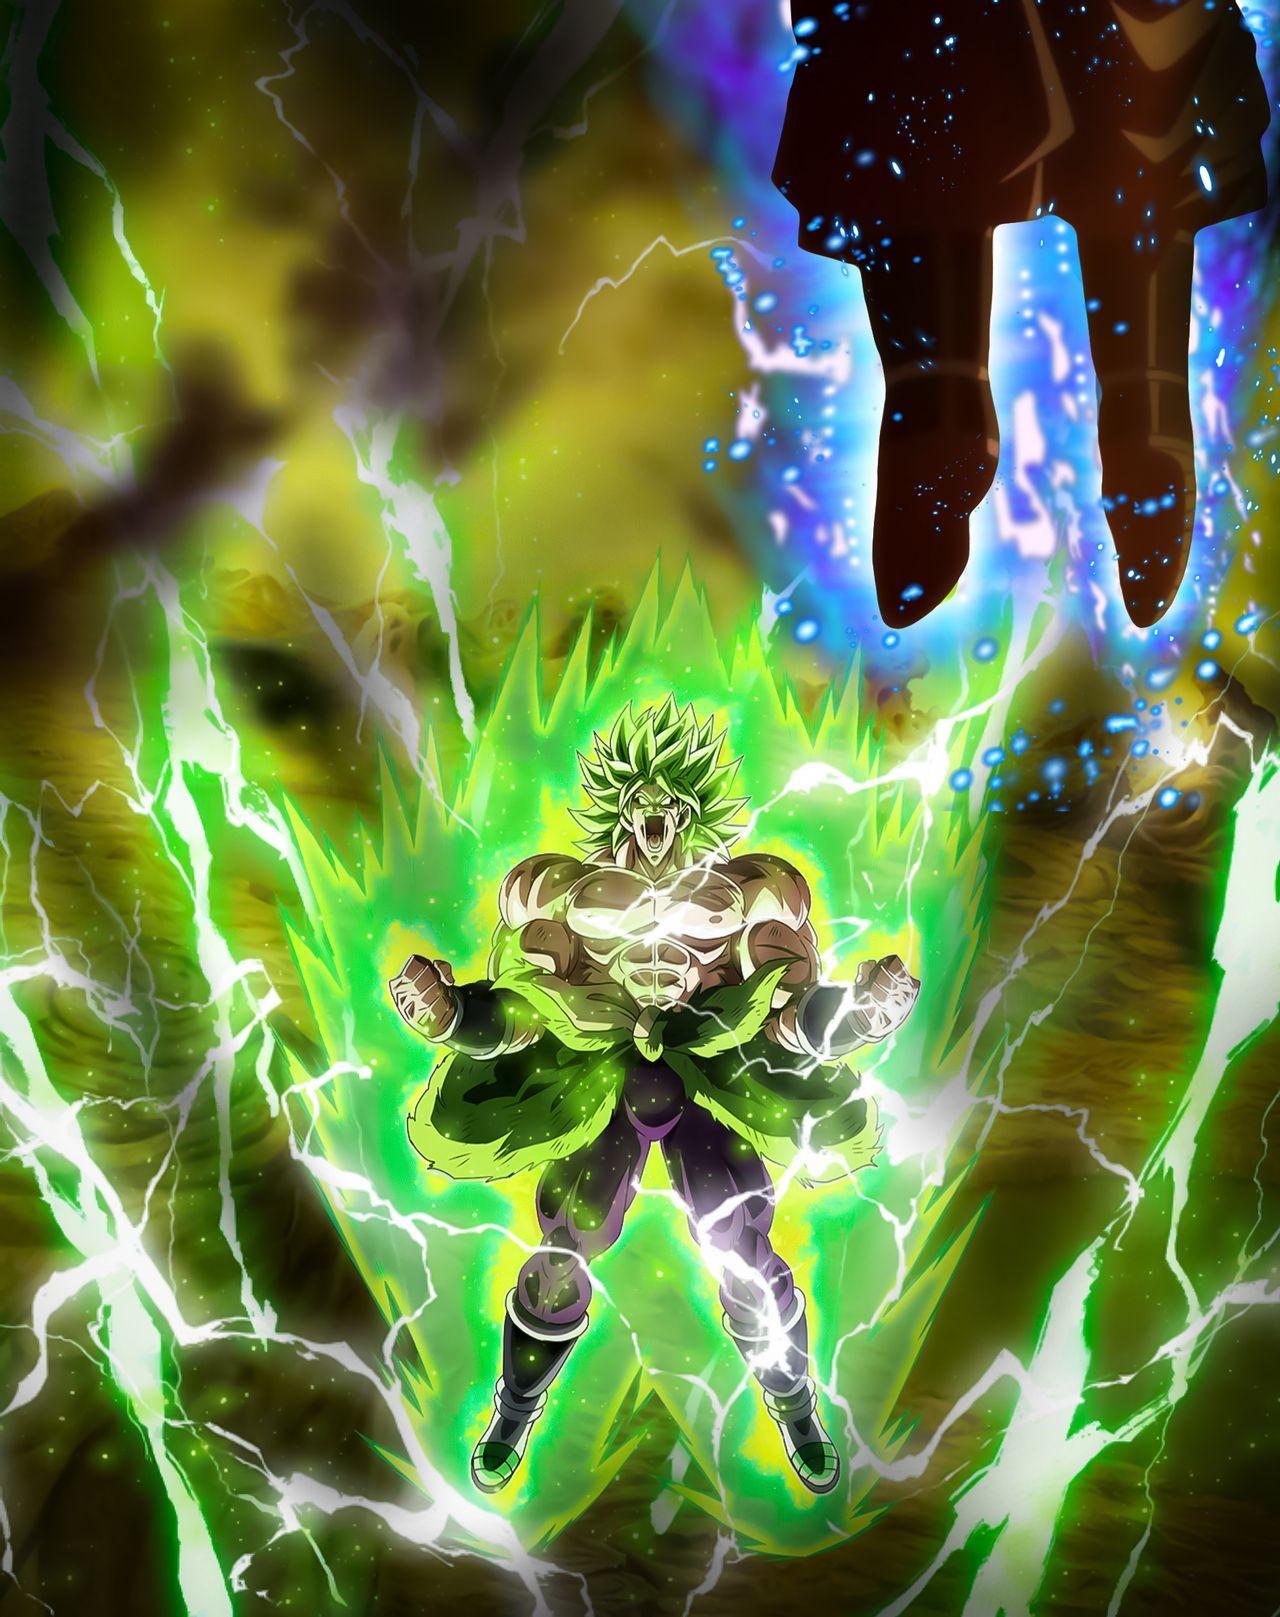 Lssj Broly Vs Mui Goku By Satzboom On Deviantart Goku Deviantart Son Goku